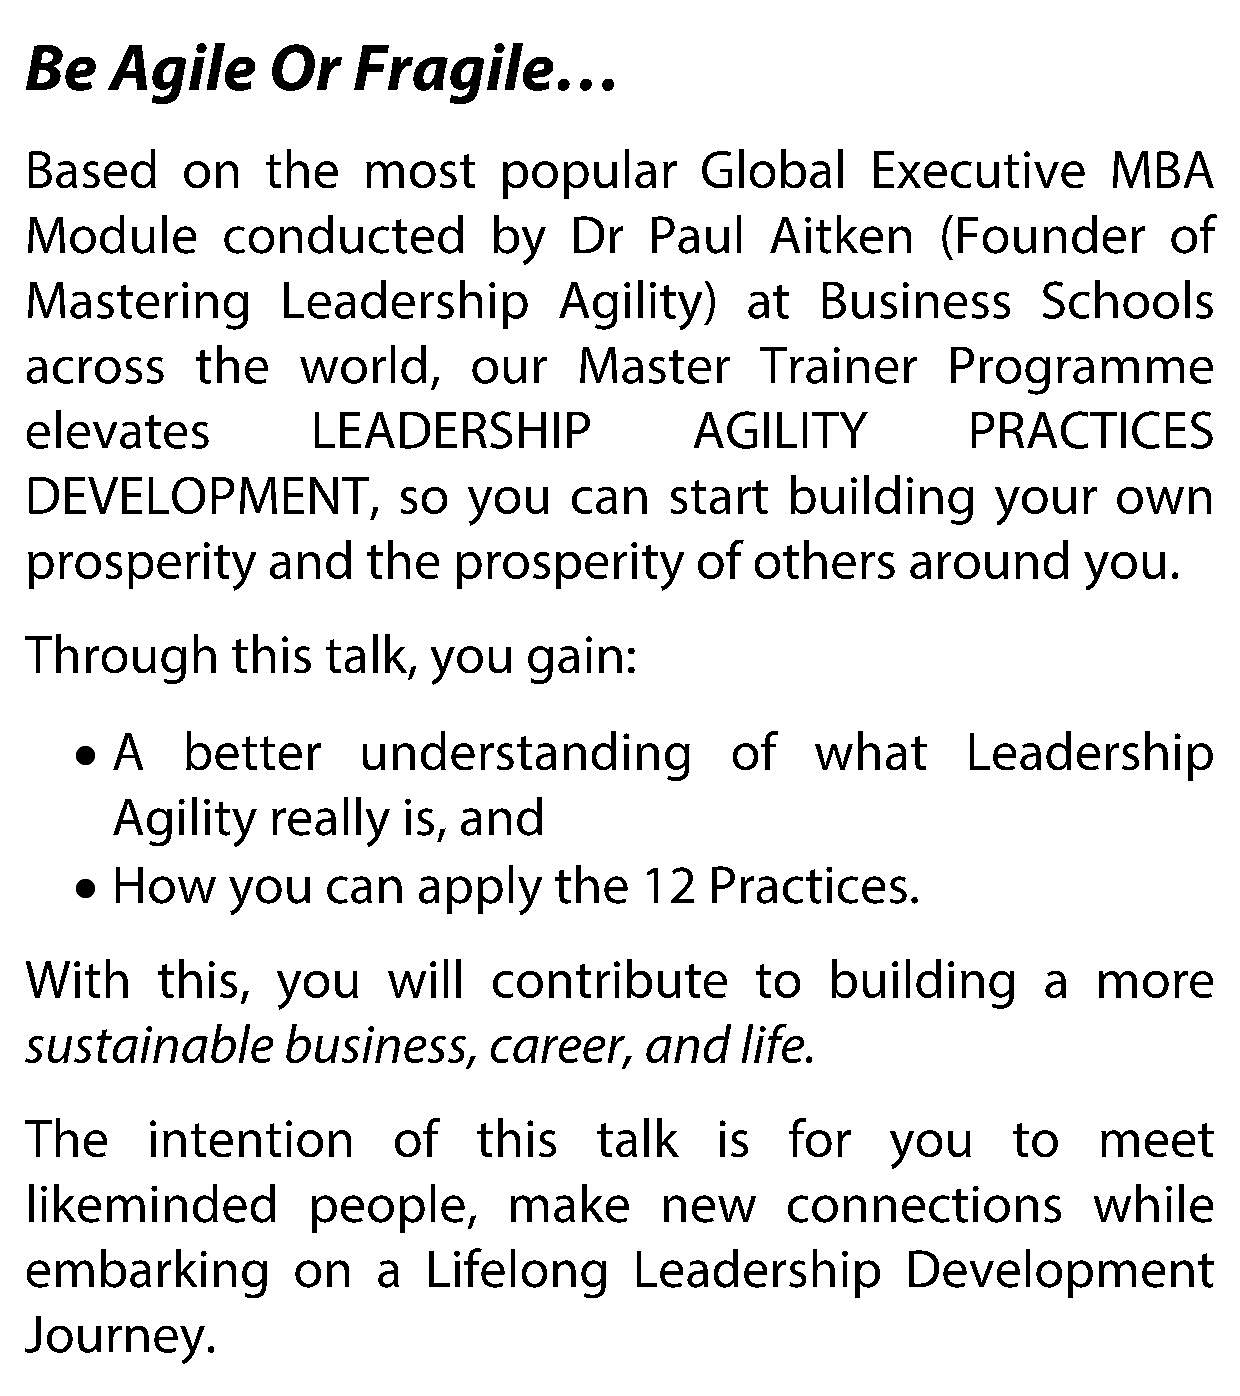 Mastering Leadership Agility - Be Agile or Fragile